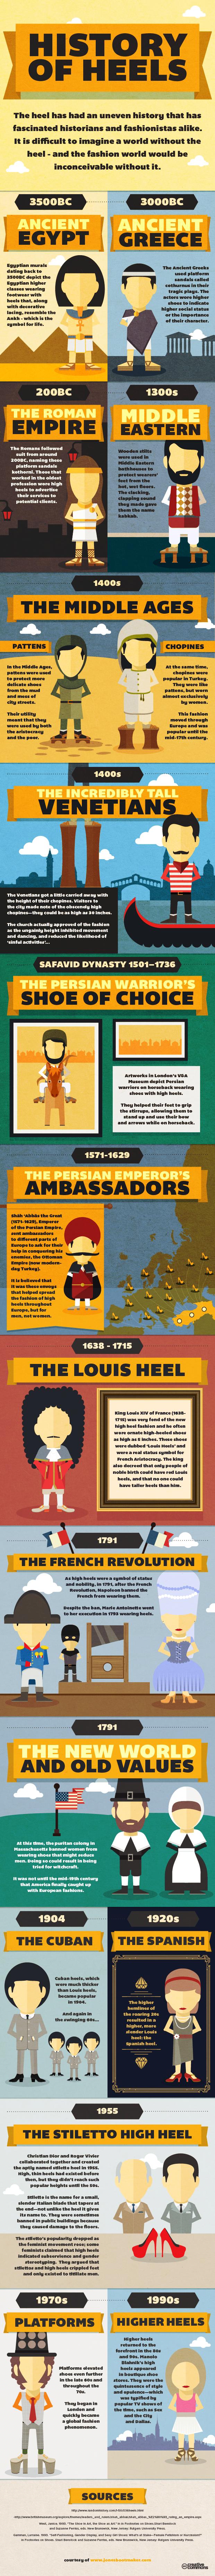 Jones Bootmaker - History of Heels Outreach